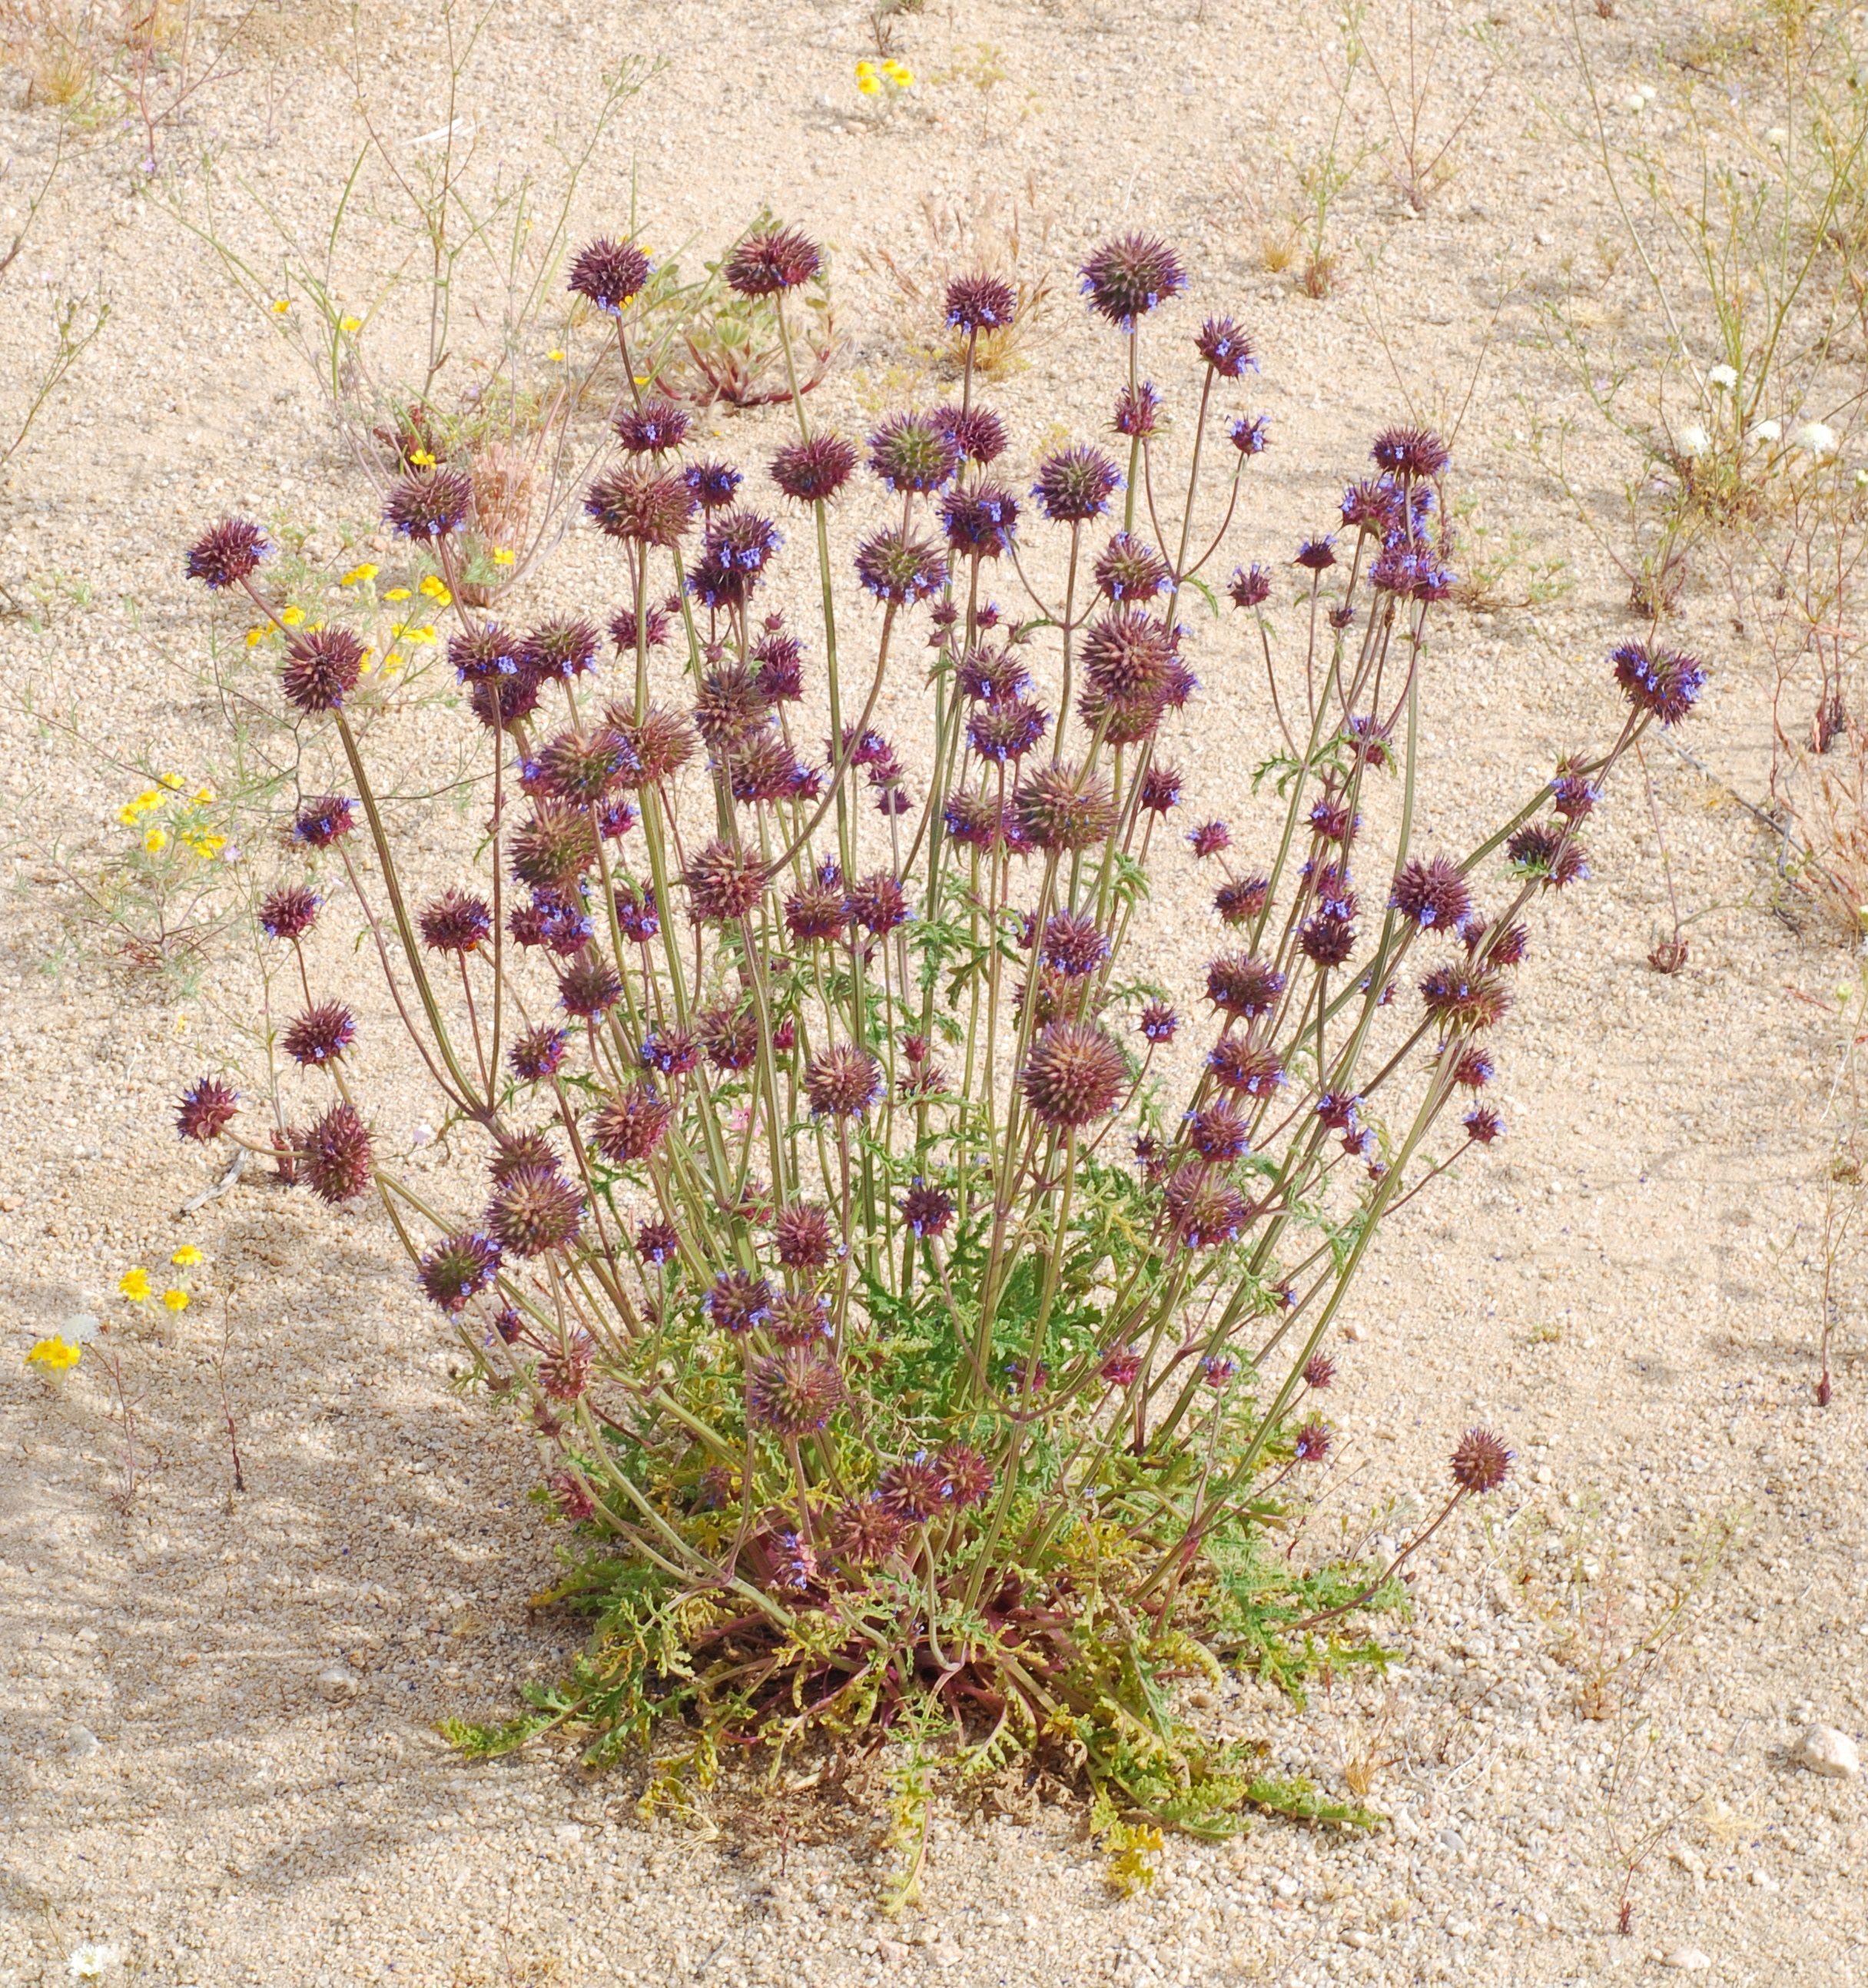 Salvia columbariae chia native annual spring flowering season native annual spring flowering season grows 0 3500 izmirmasajfo